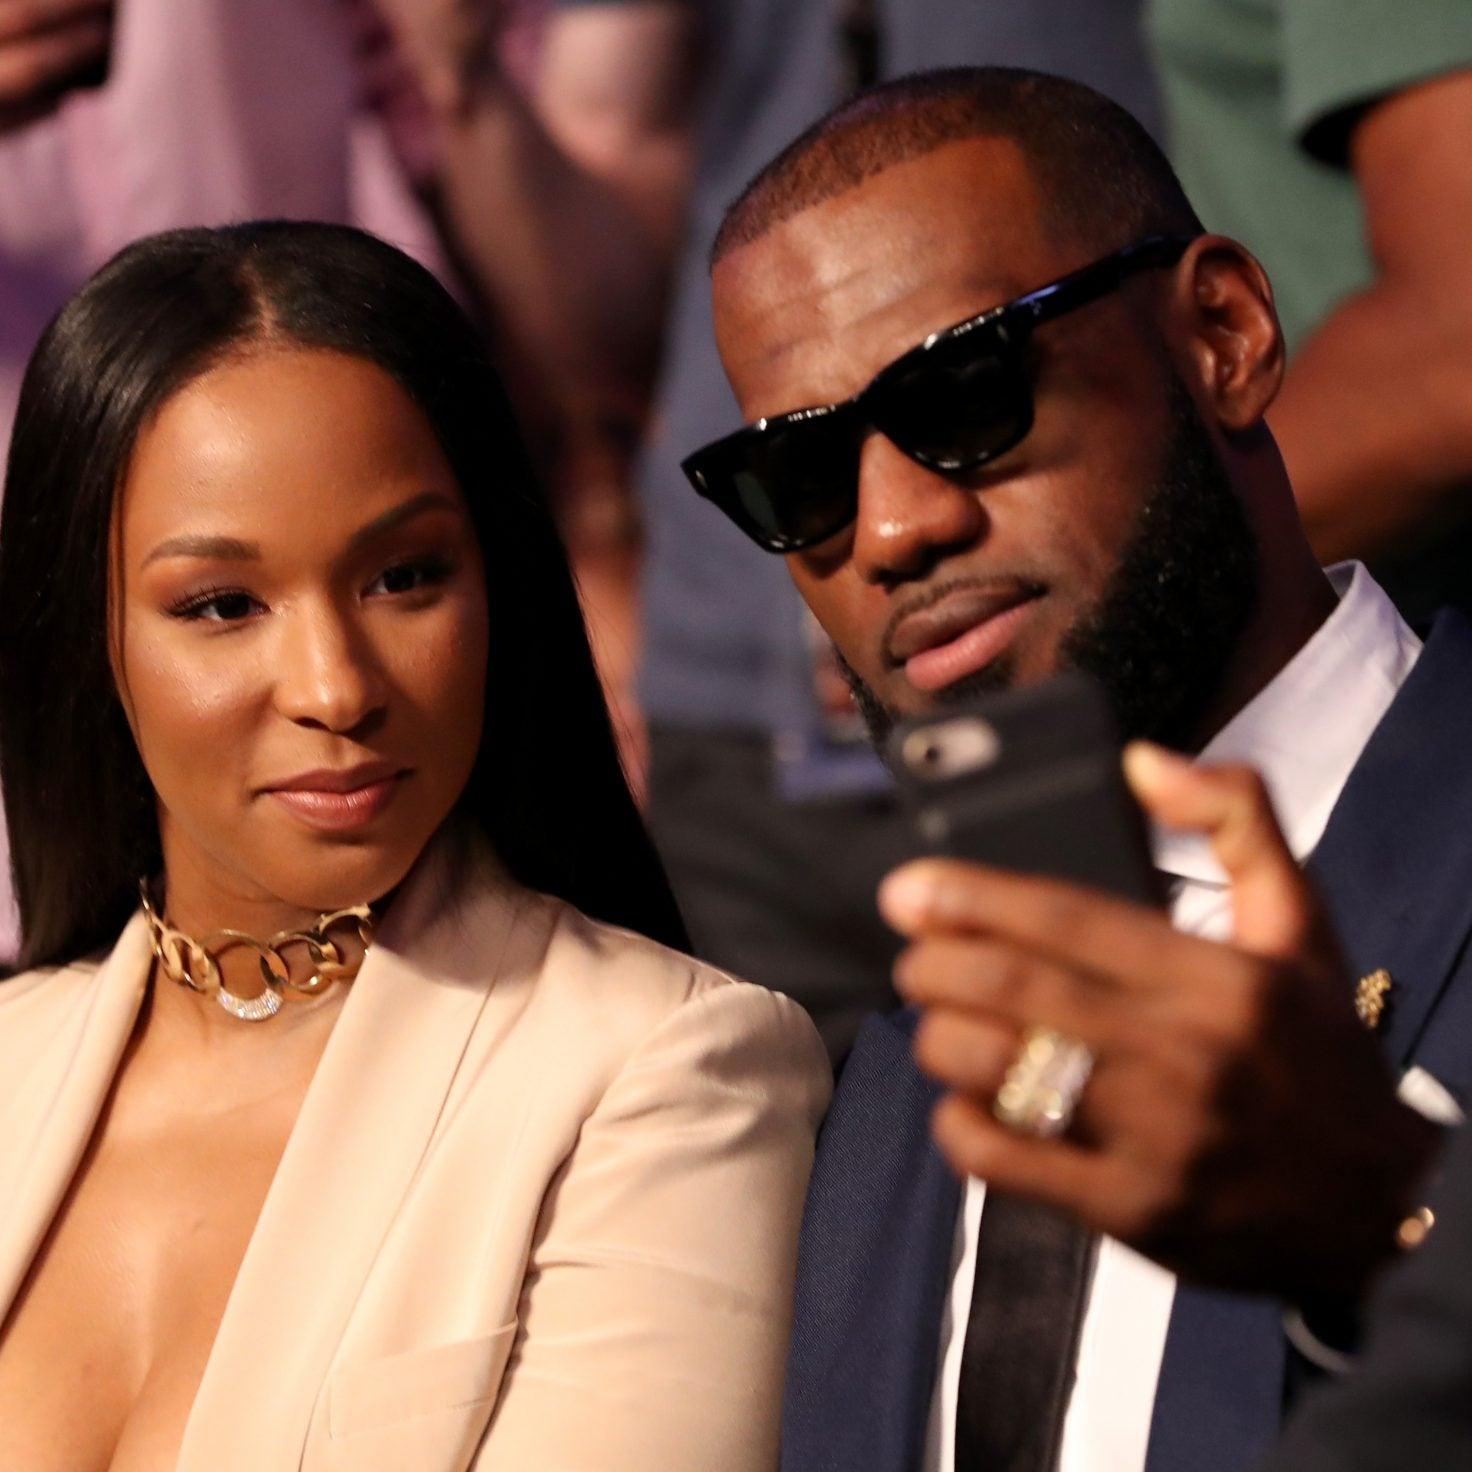 This Week In Black Love: LeBron James Celebrates His Wife Savannah And More!